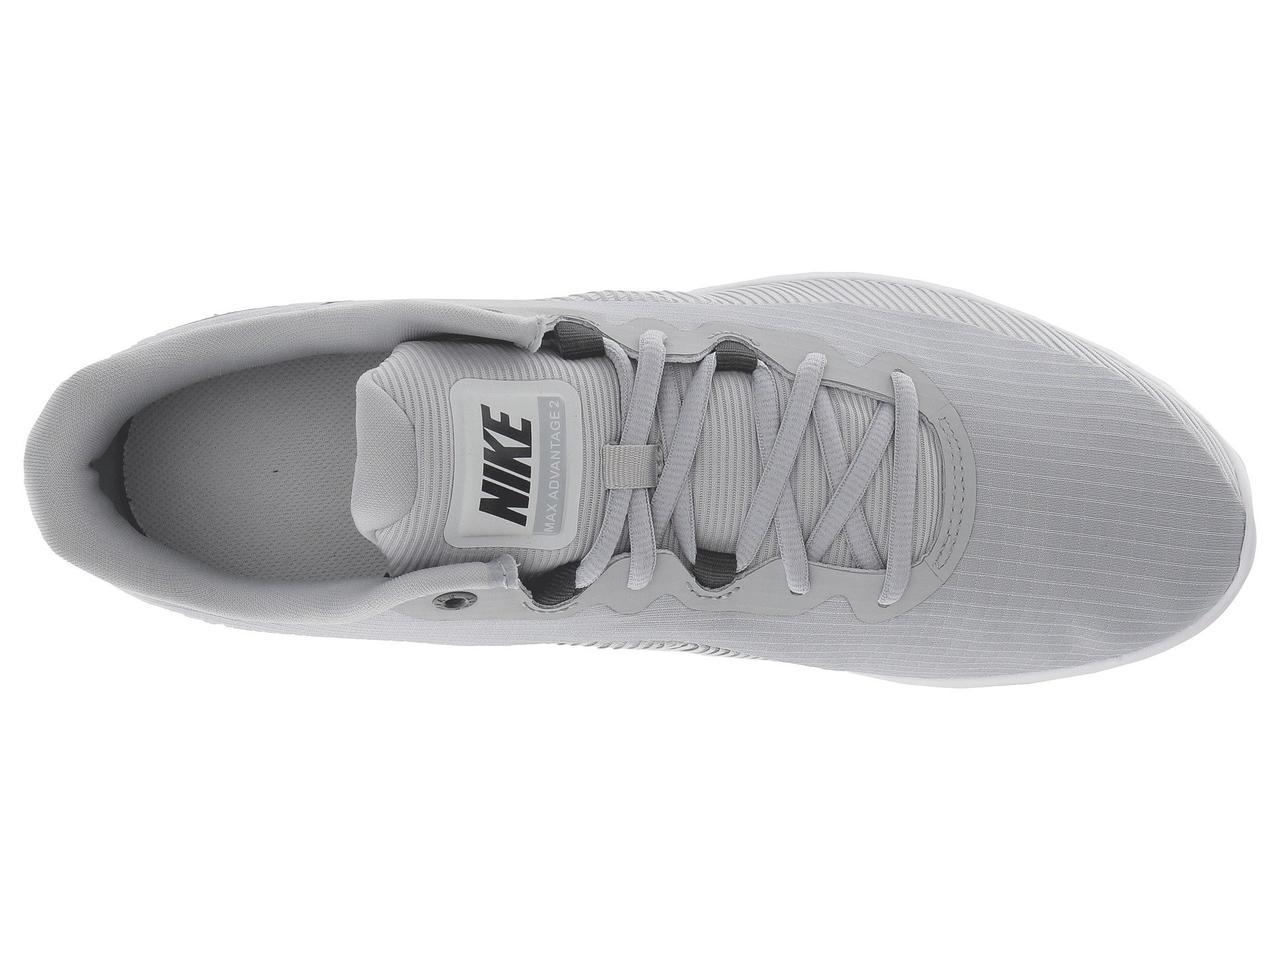 67c86daf734e86 ... Кроссовки Кеды (Оригинал) Nike Air Max Advantage 2 Wolf  Grey Anthracite  ...